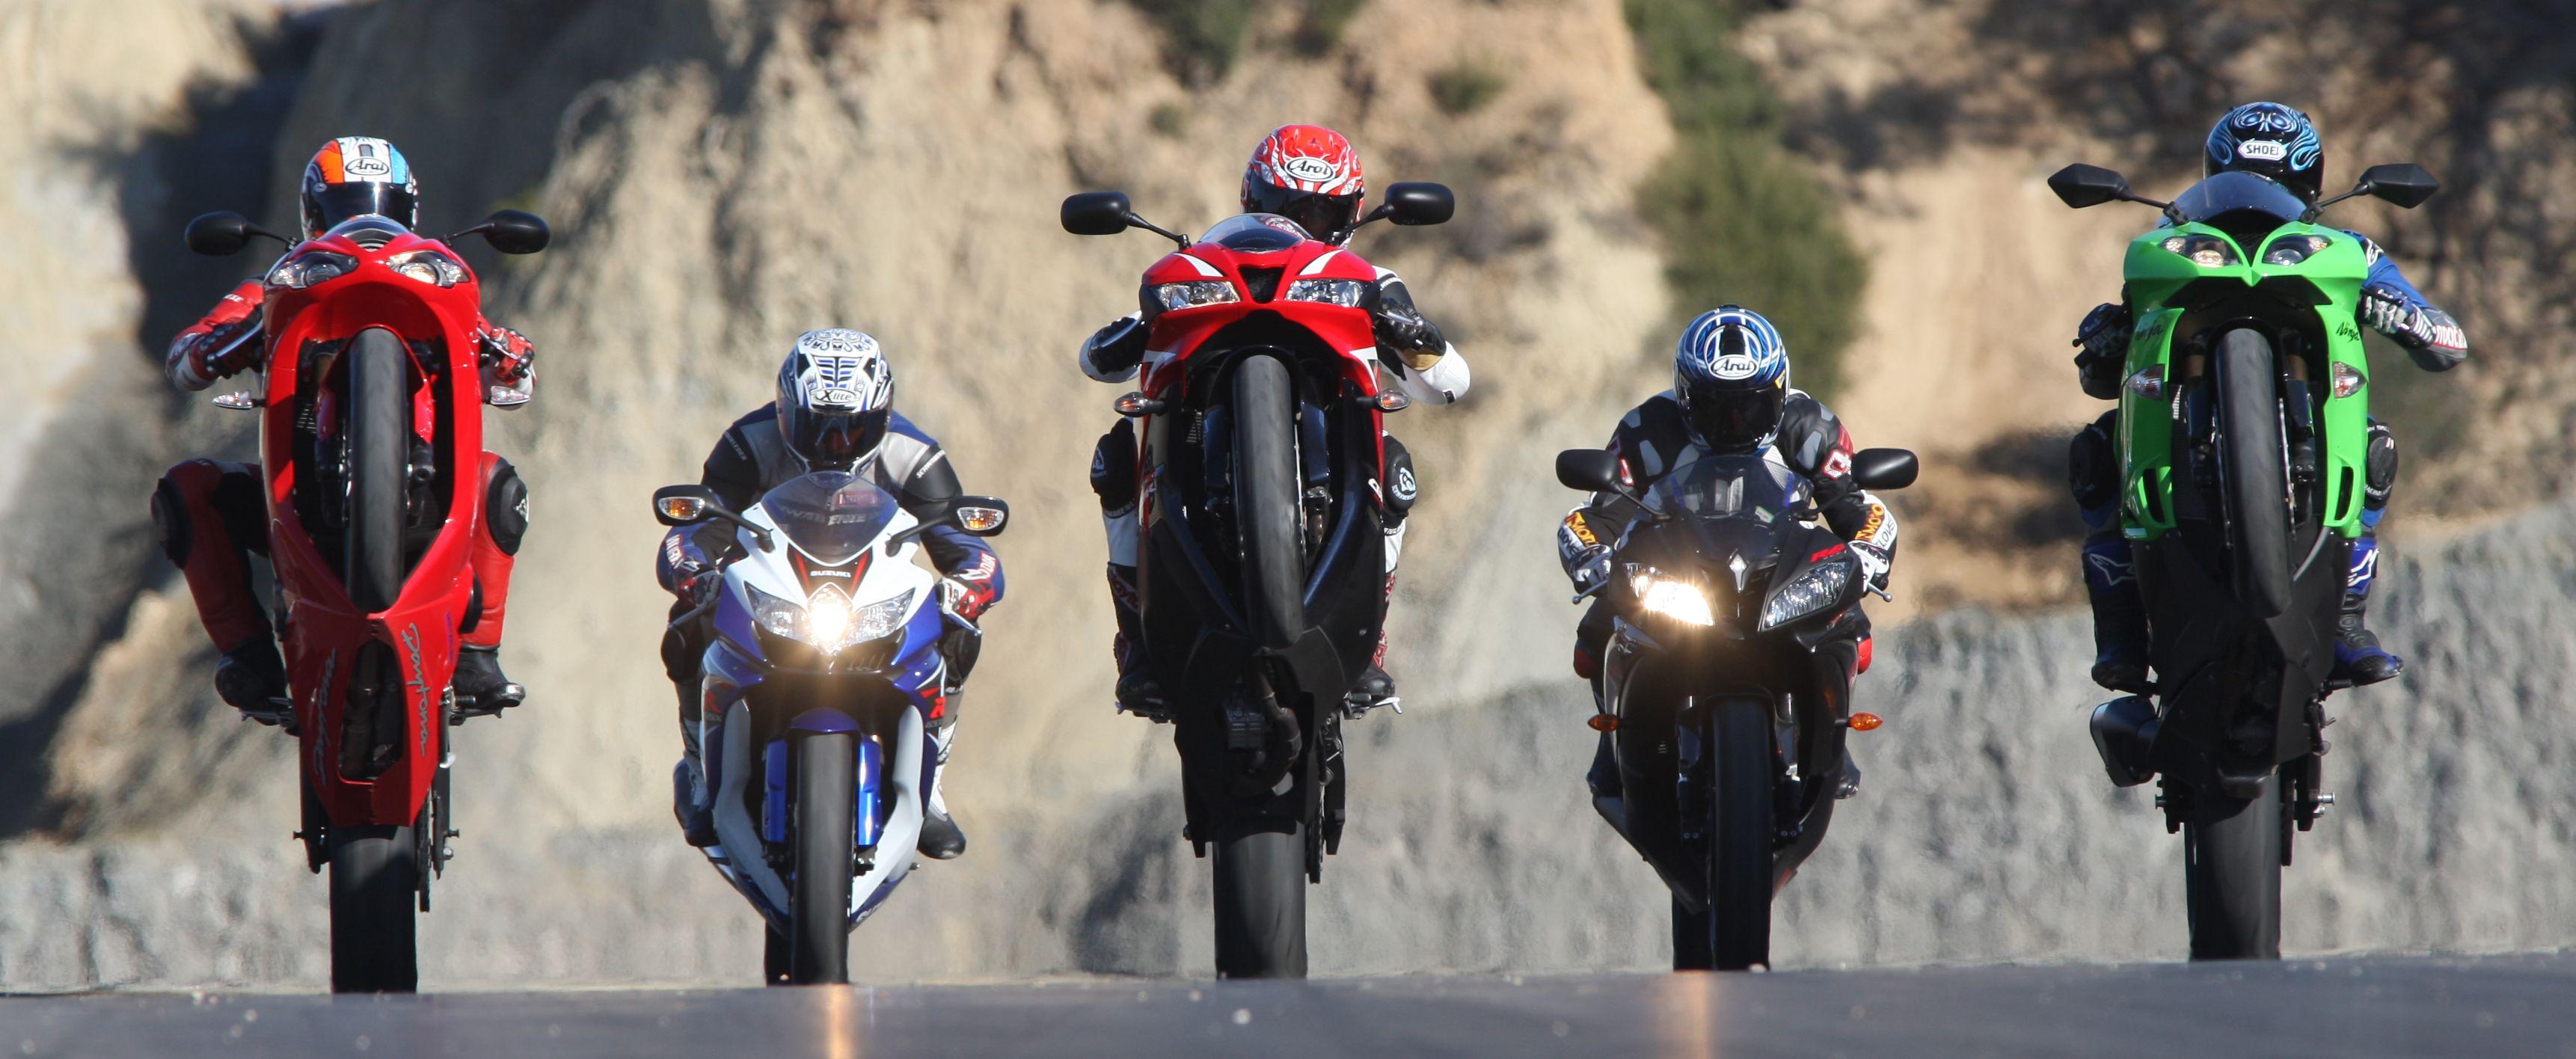 Five Super Sport bikes racing on Calafat's sunbaked